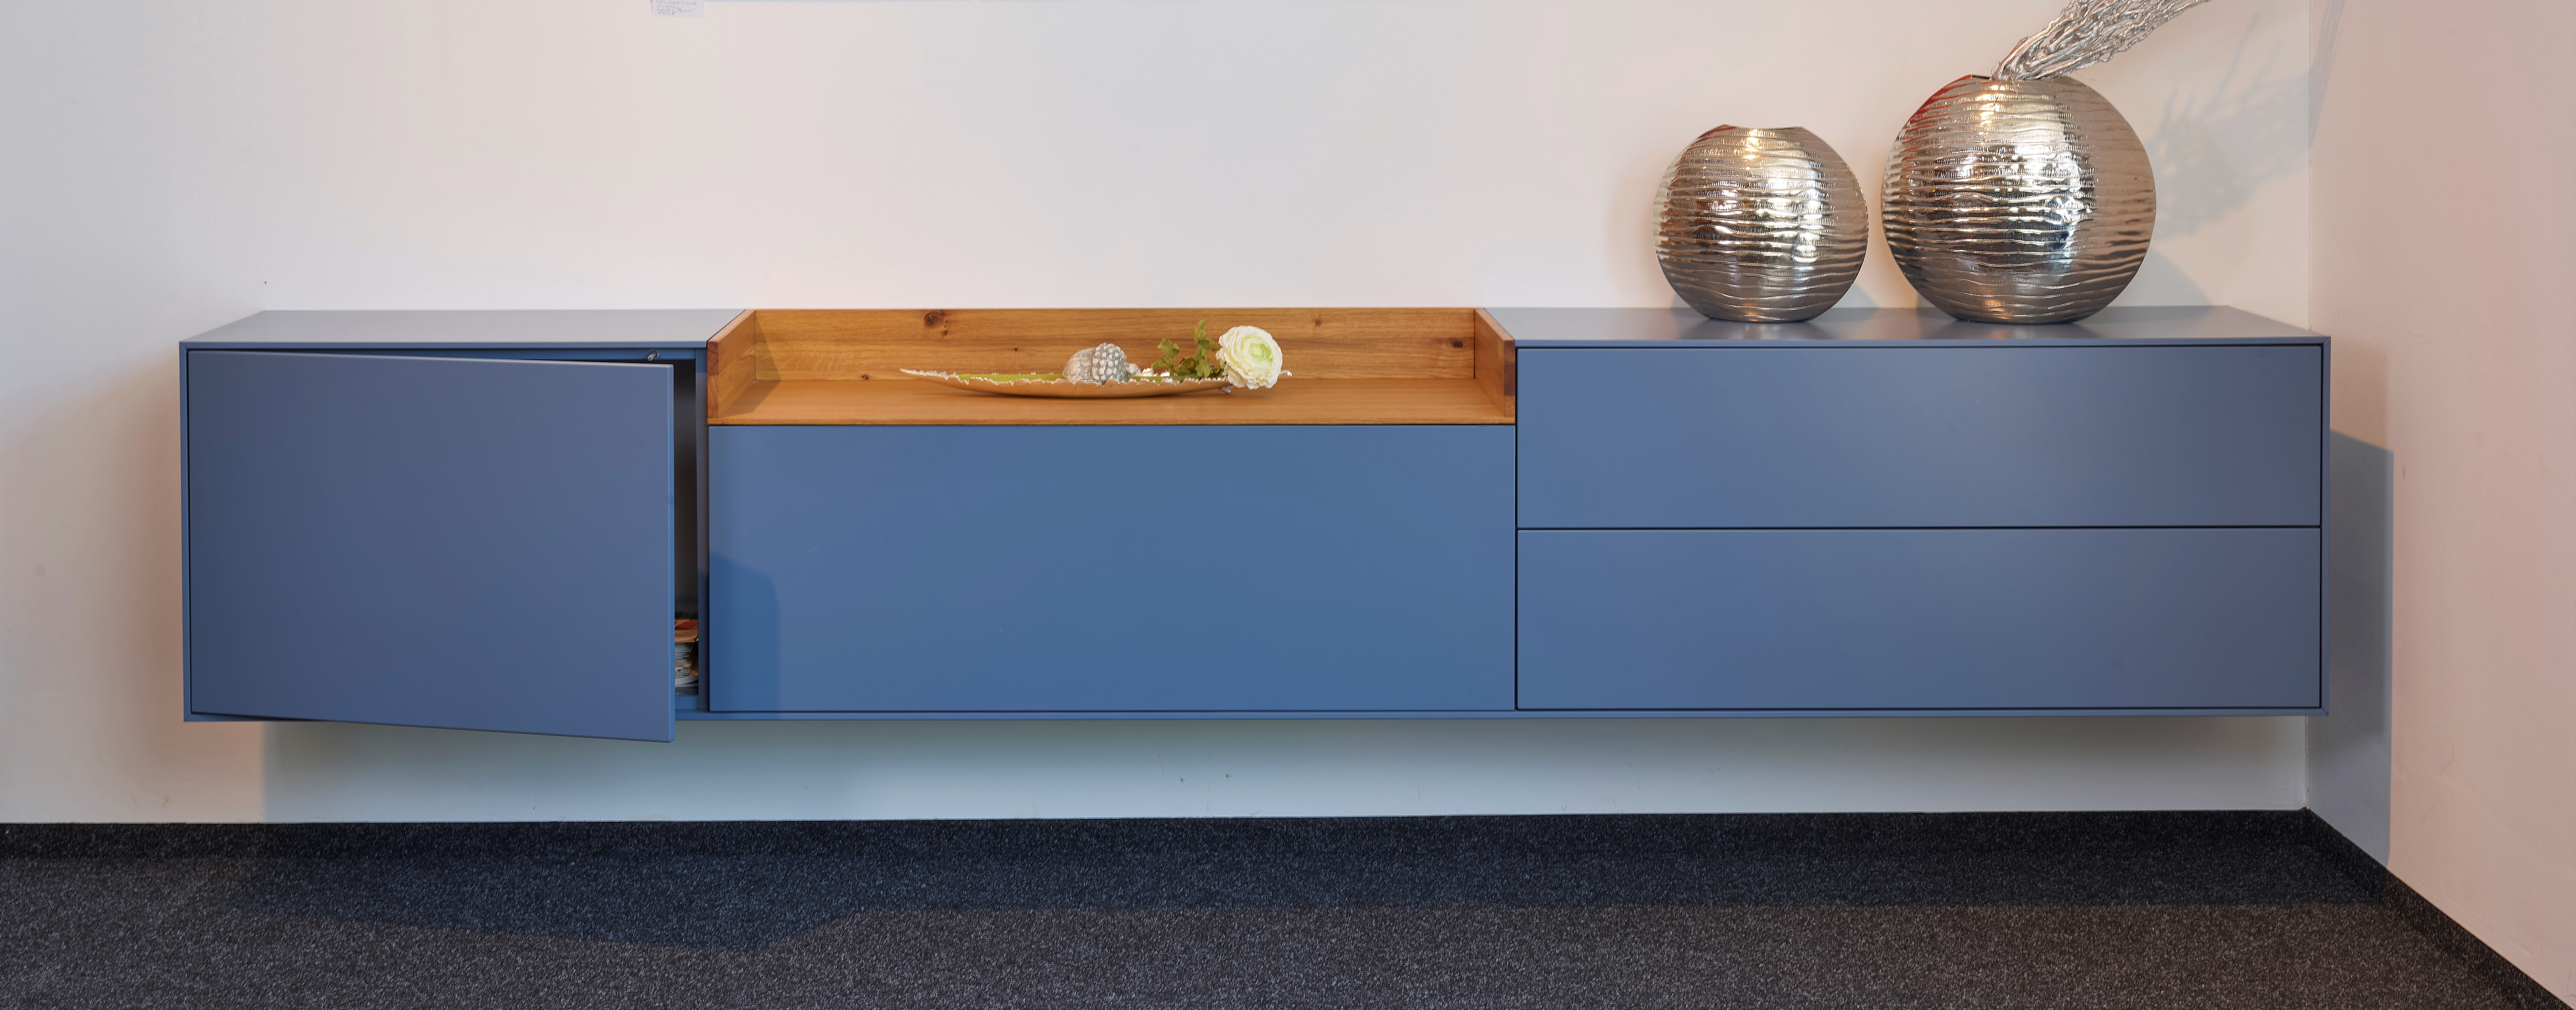 Sideboard 8705BL00